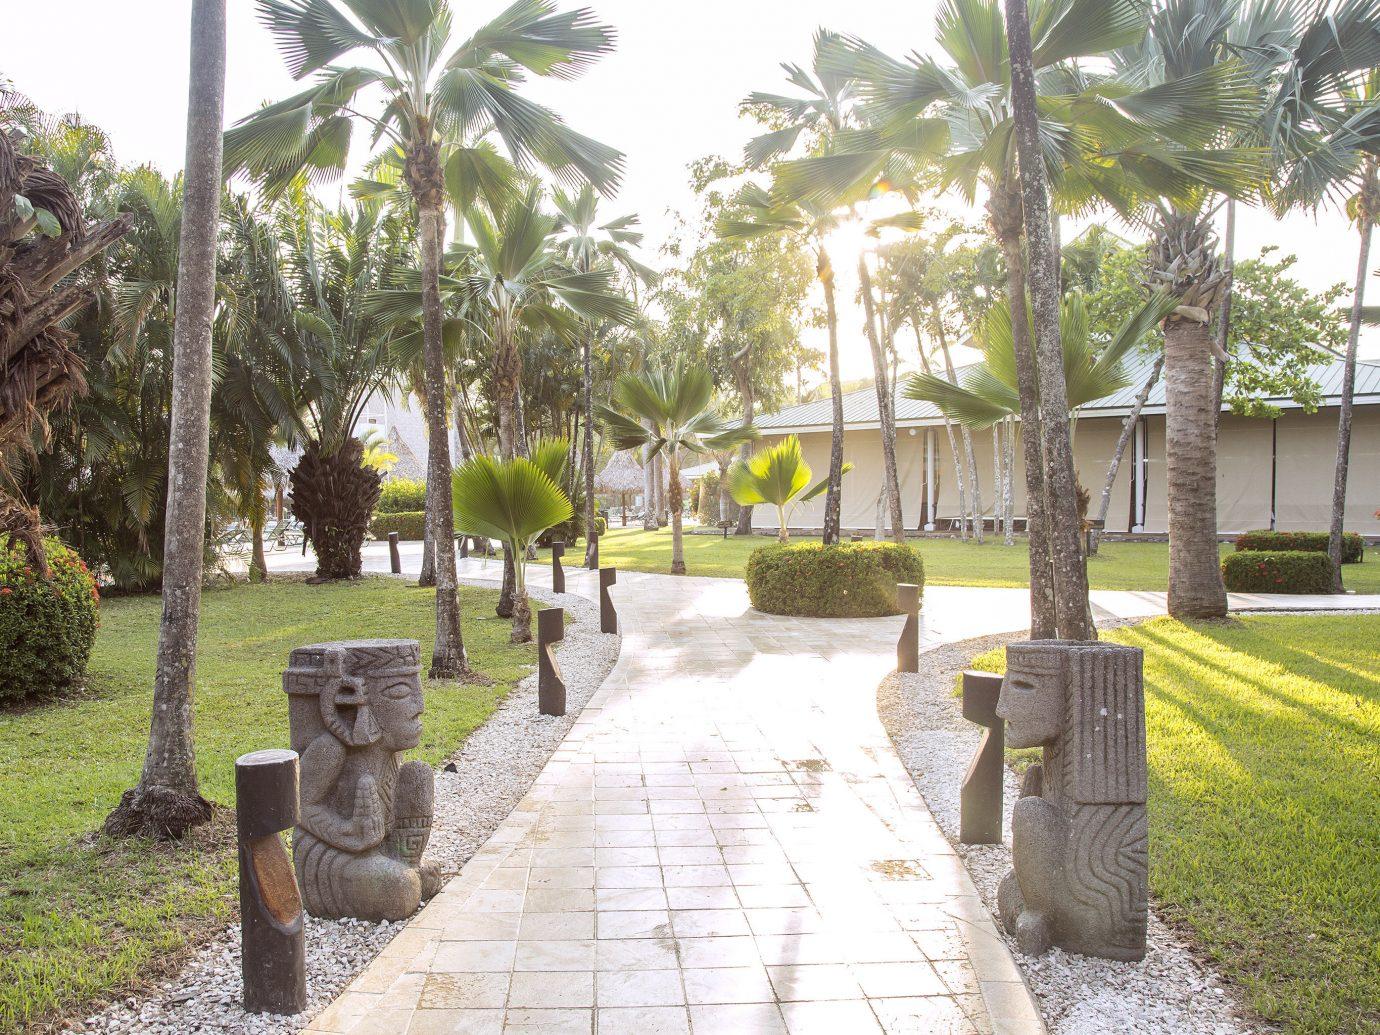 Barcelo Tambor in Costa Rica